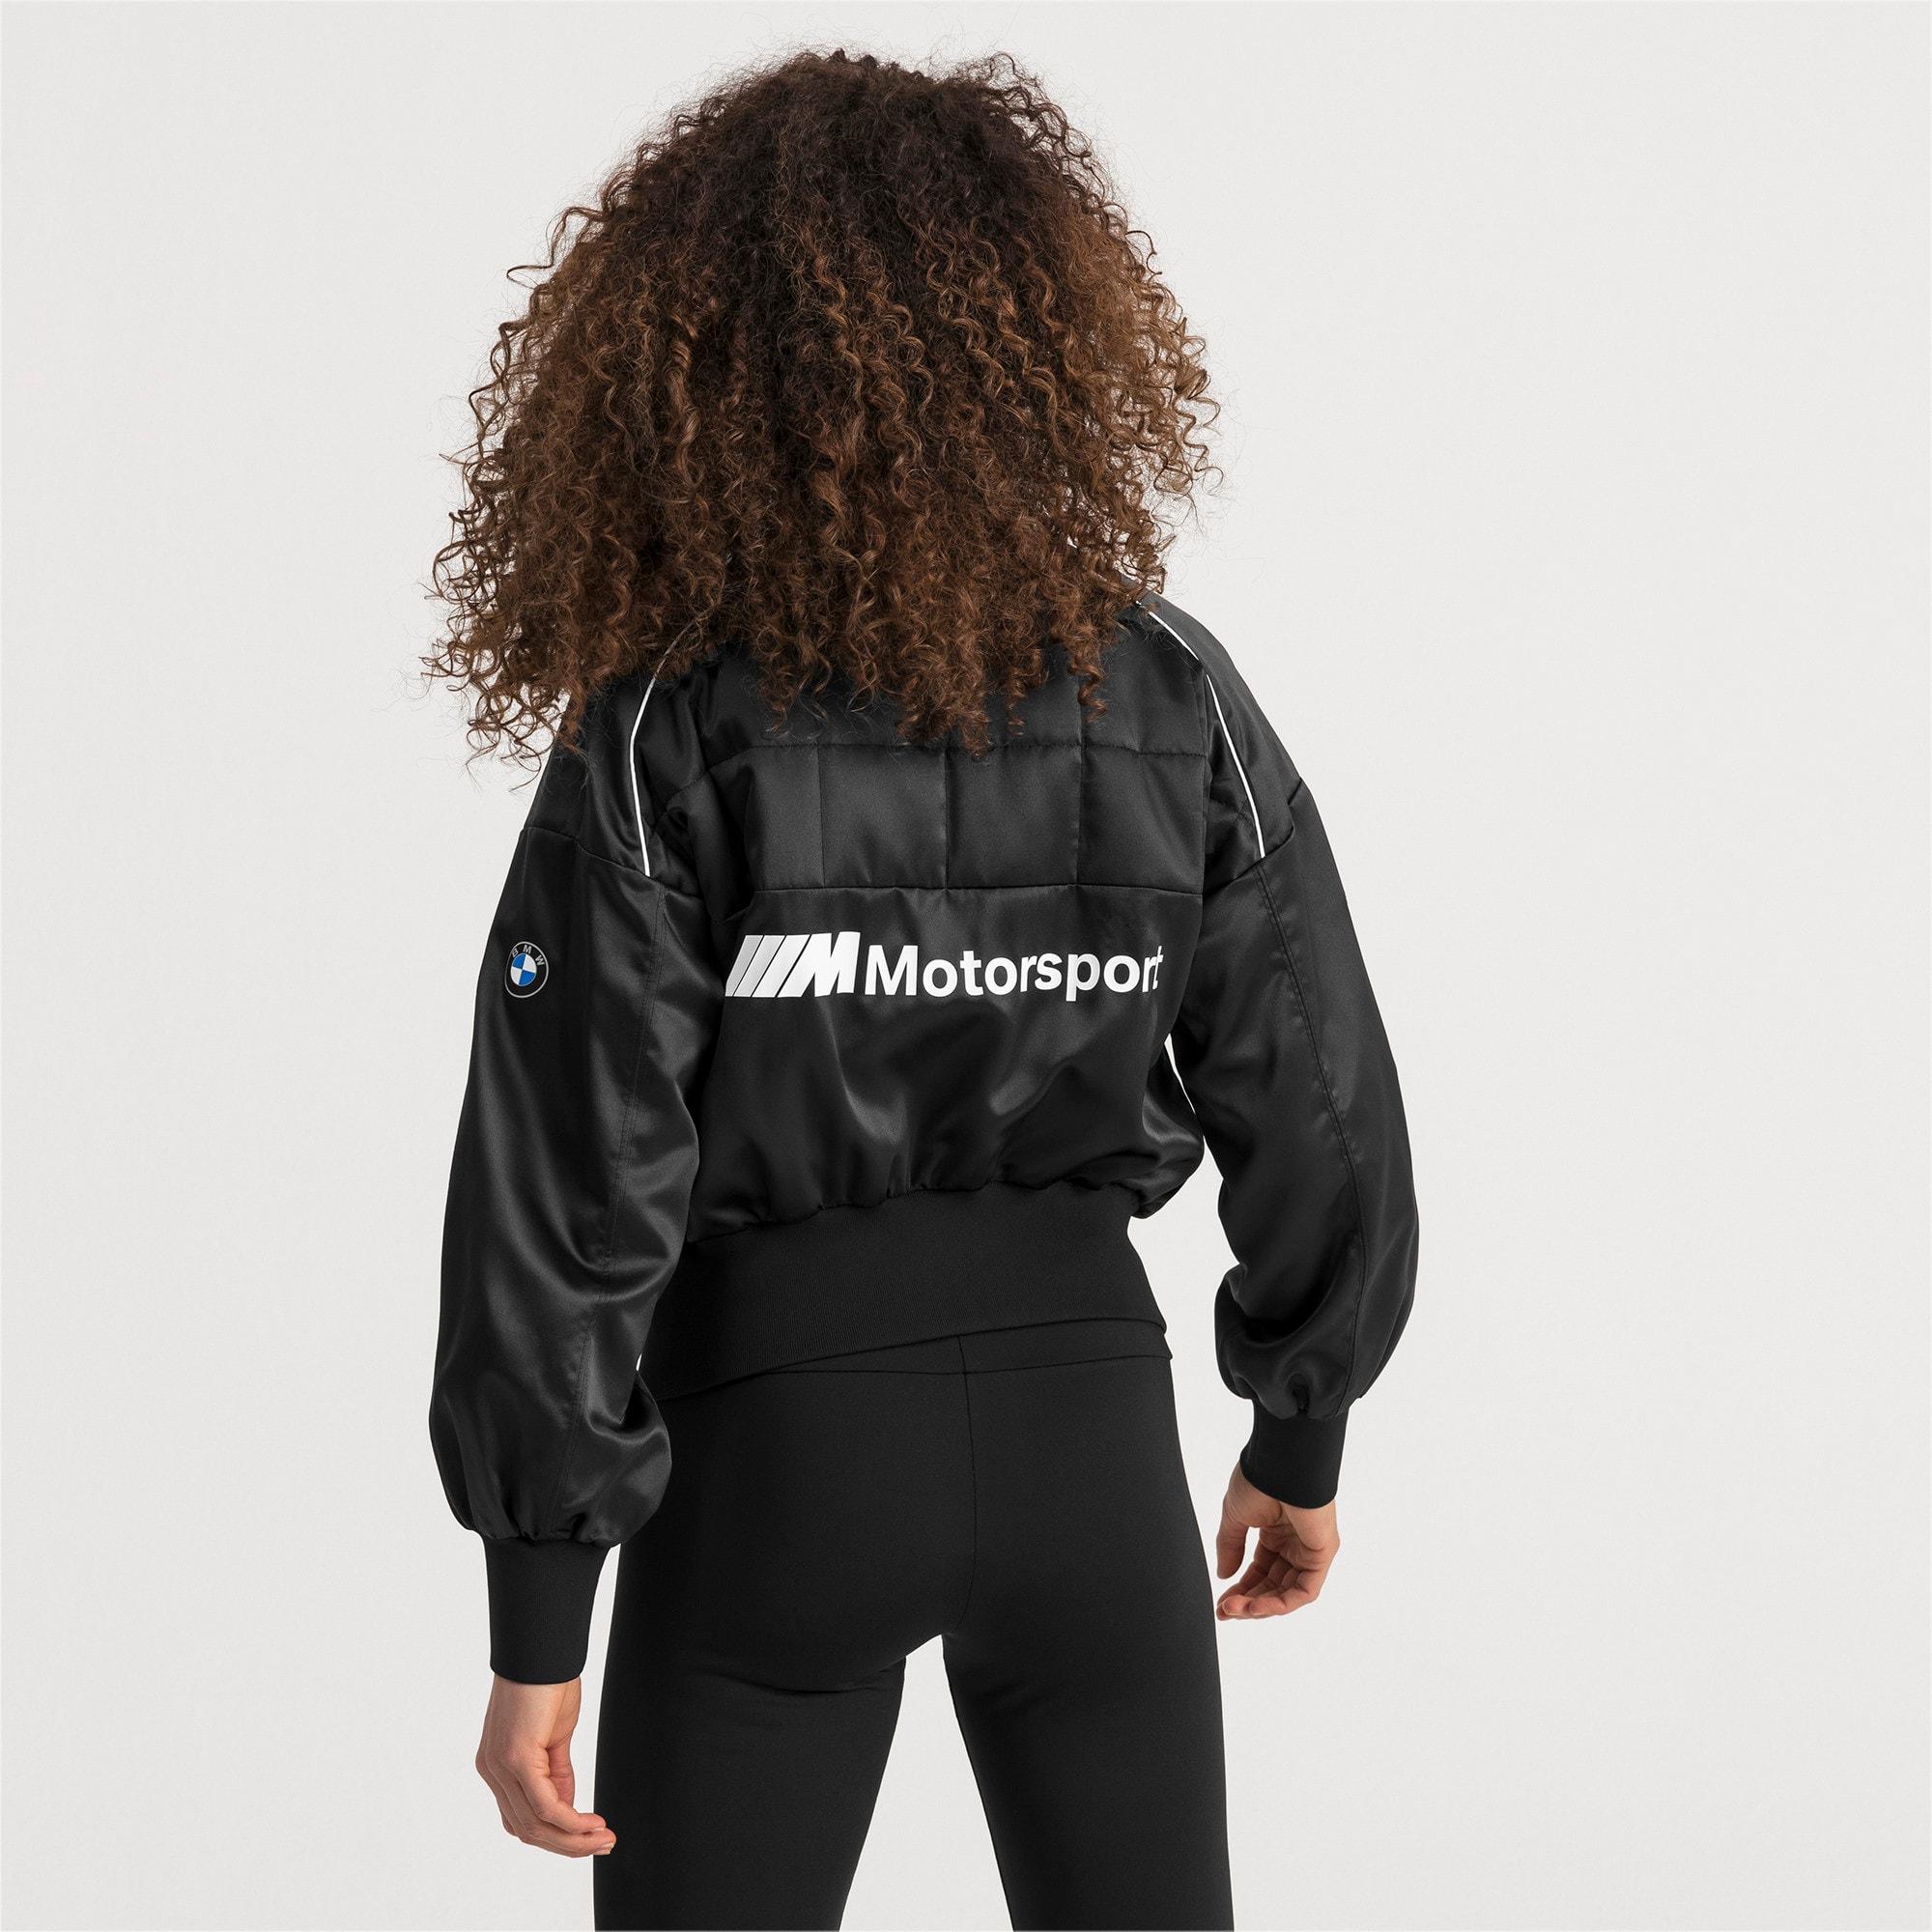 Thumbnail 2 of BMW M Motorsport Women's Street Jacket, Puma Black, medium